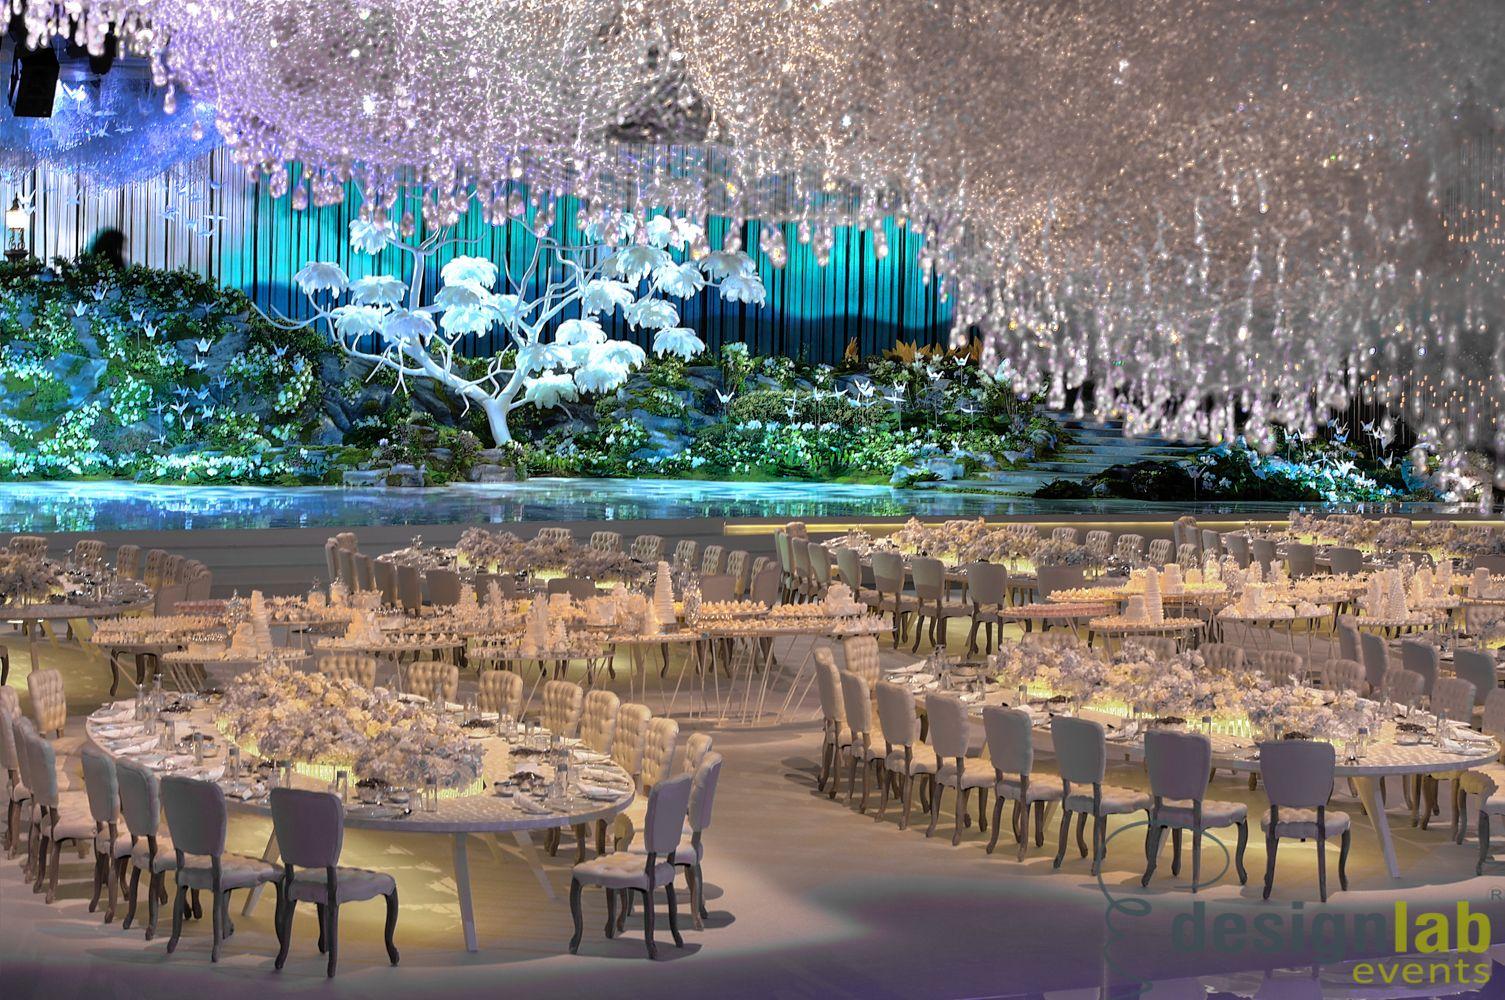 Lucid Dream Wedding Setup By Designlab Events 2nd Jan 2014